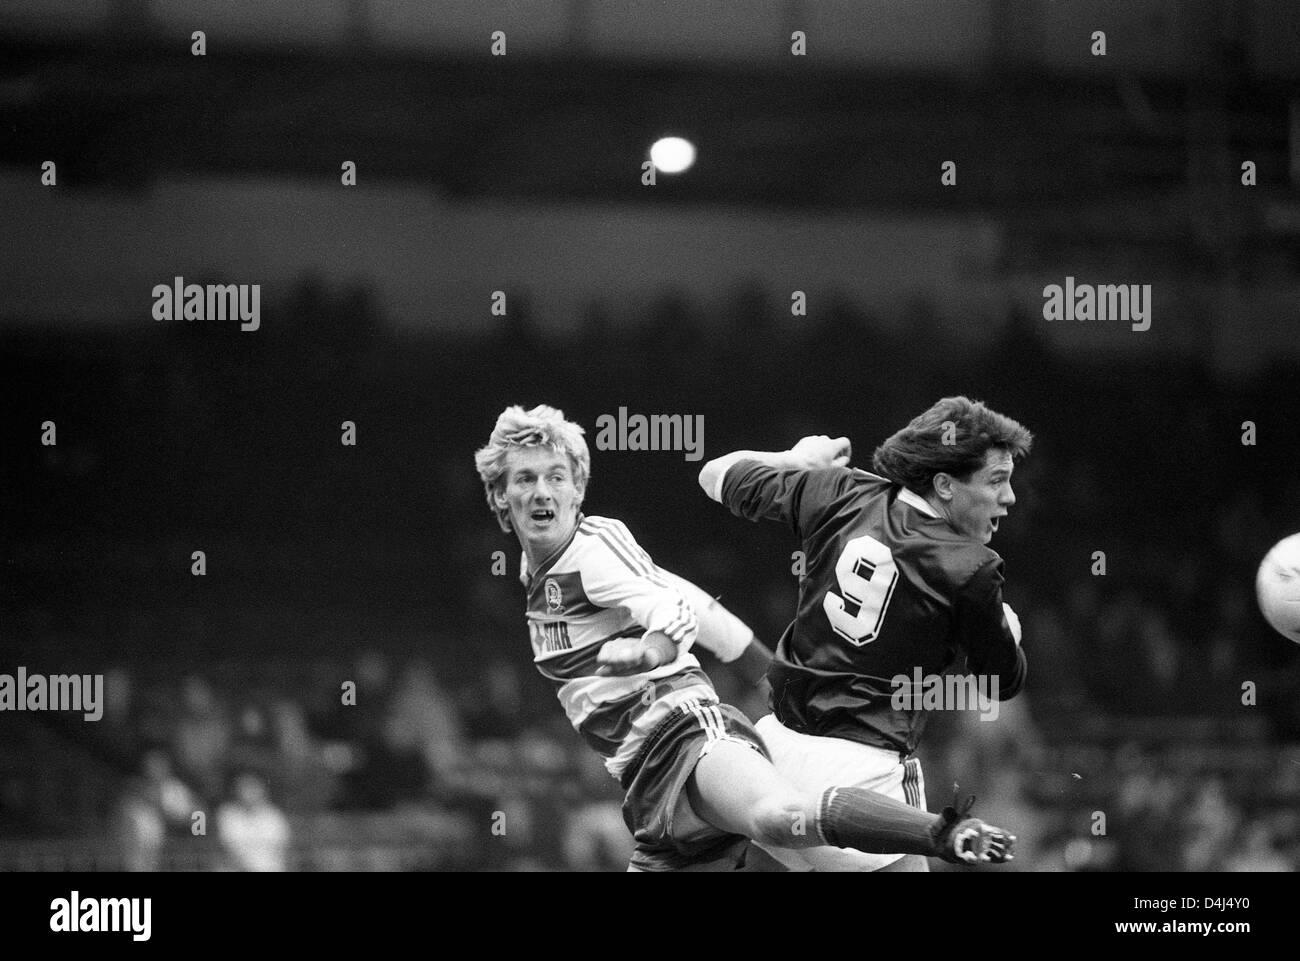 Alan McDonald and Simon Stainrod Aston Villa v Queens Park Rangers at Villa Park 7/2/87 - Stock Image